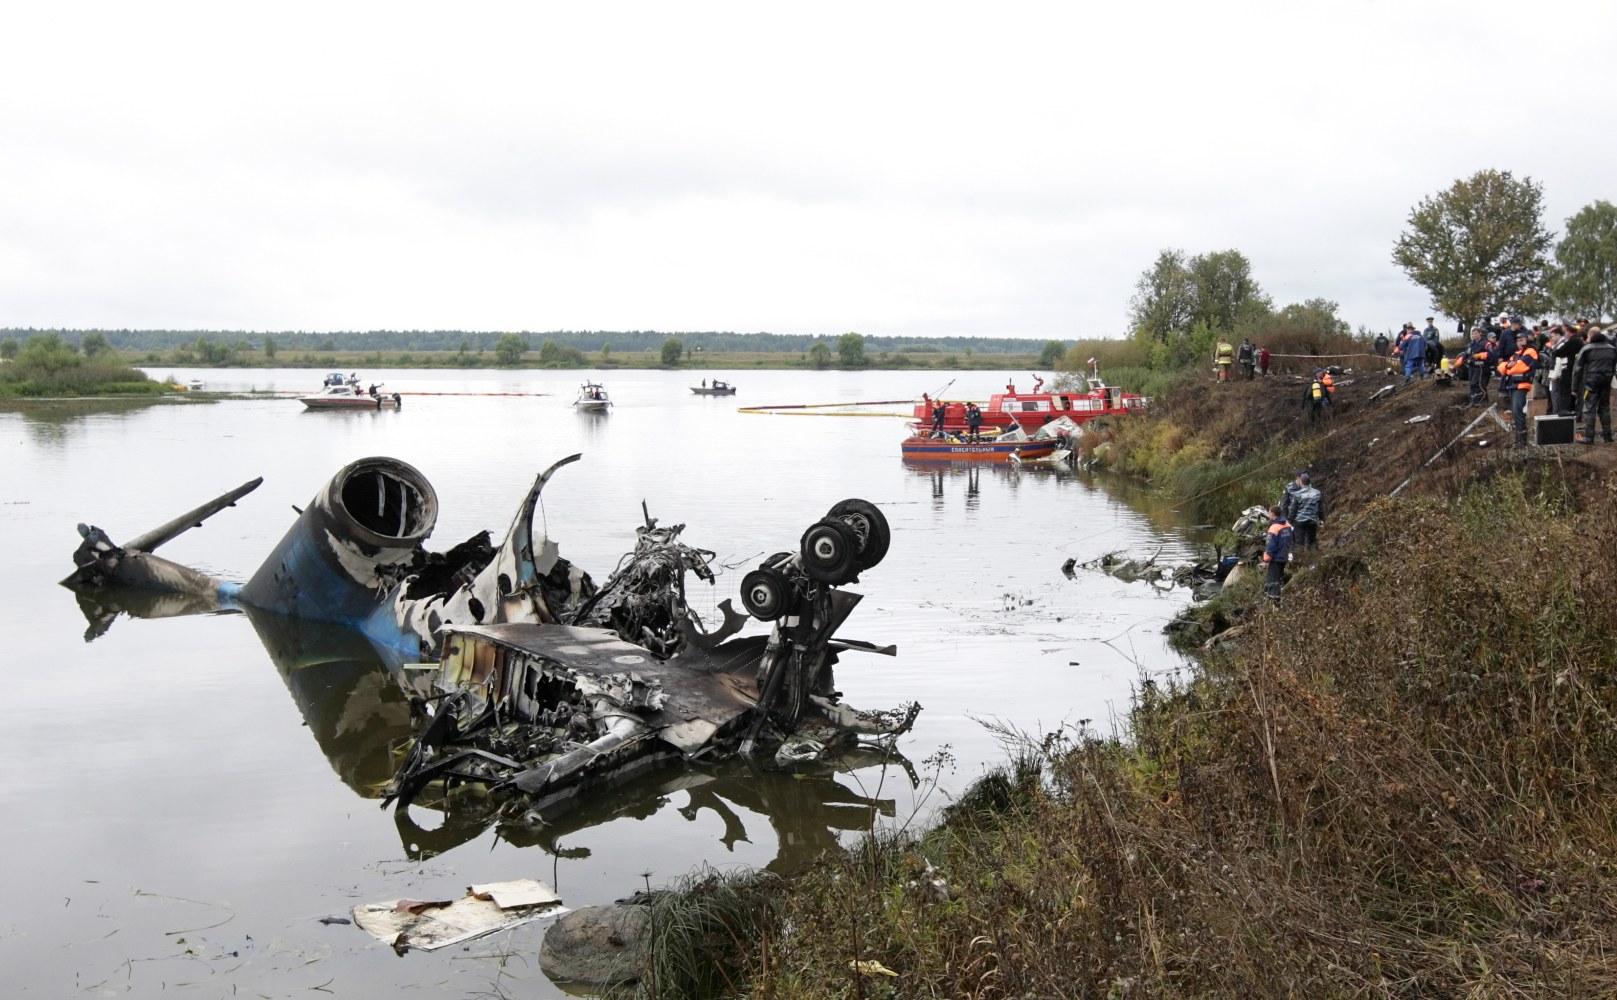 http://media2.s-nbcnews.com/j/newscms/2016_48/1812216/161129-lokomotiv-hockey-team-plane-crash-cr-0500_c00ad59ace2d91dabd3007036b2b4536.nbcnews-ux-2880-1000.jpg